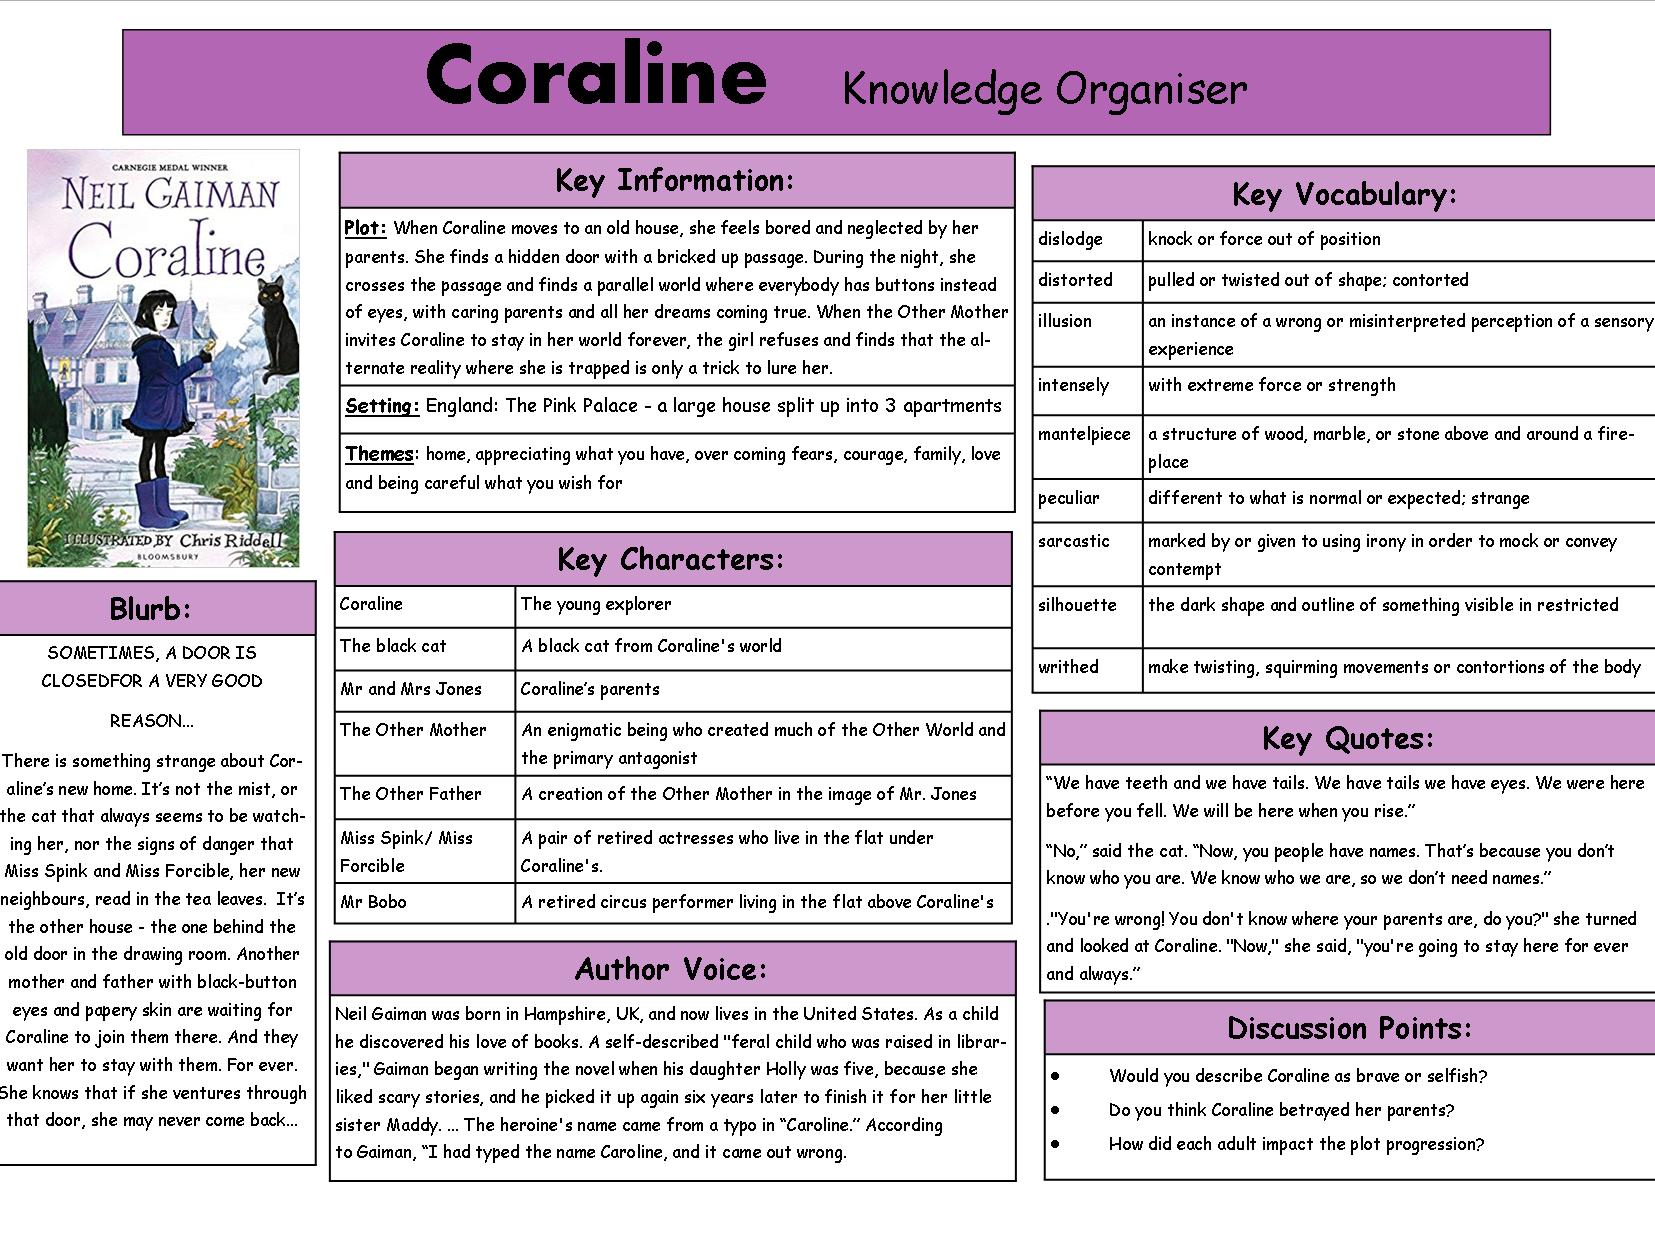 Coraline Knowledge organiser